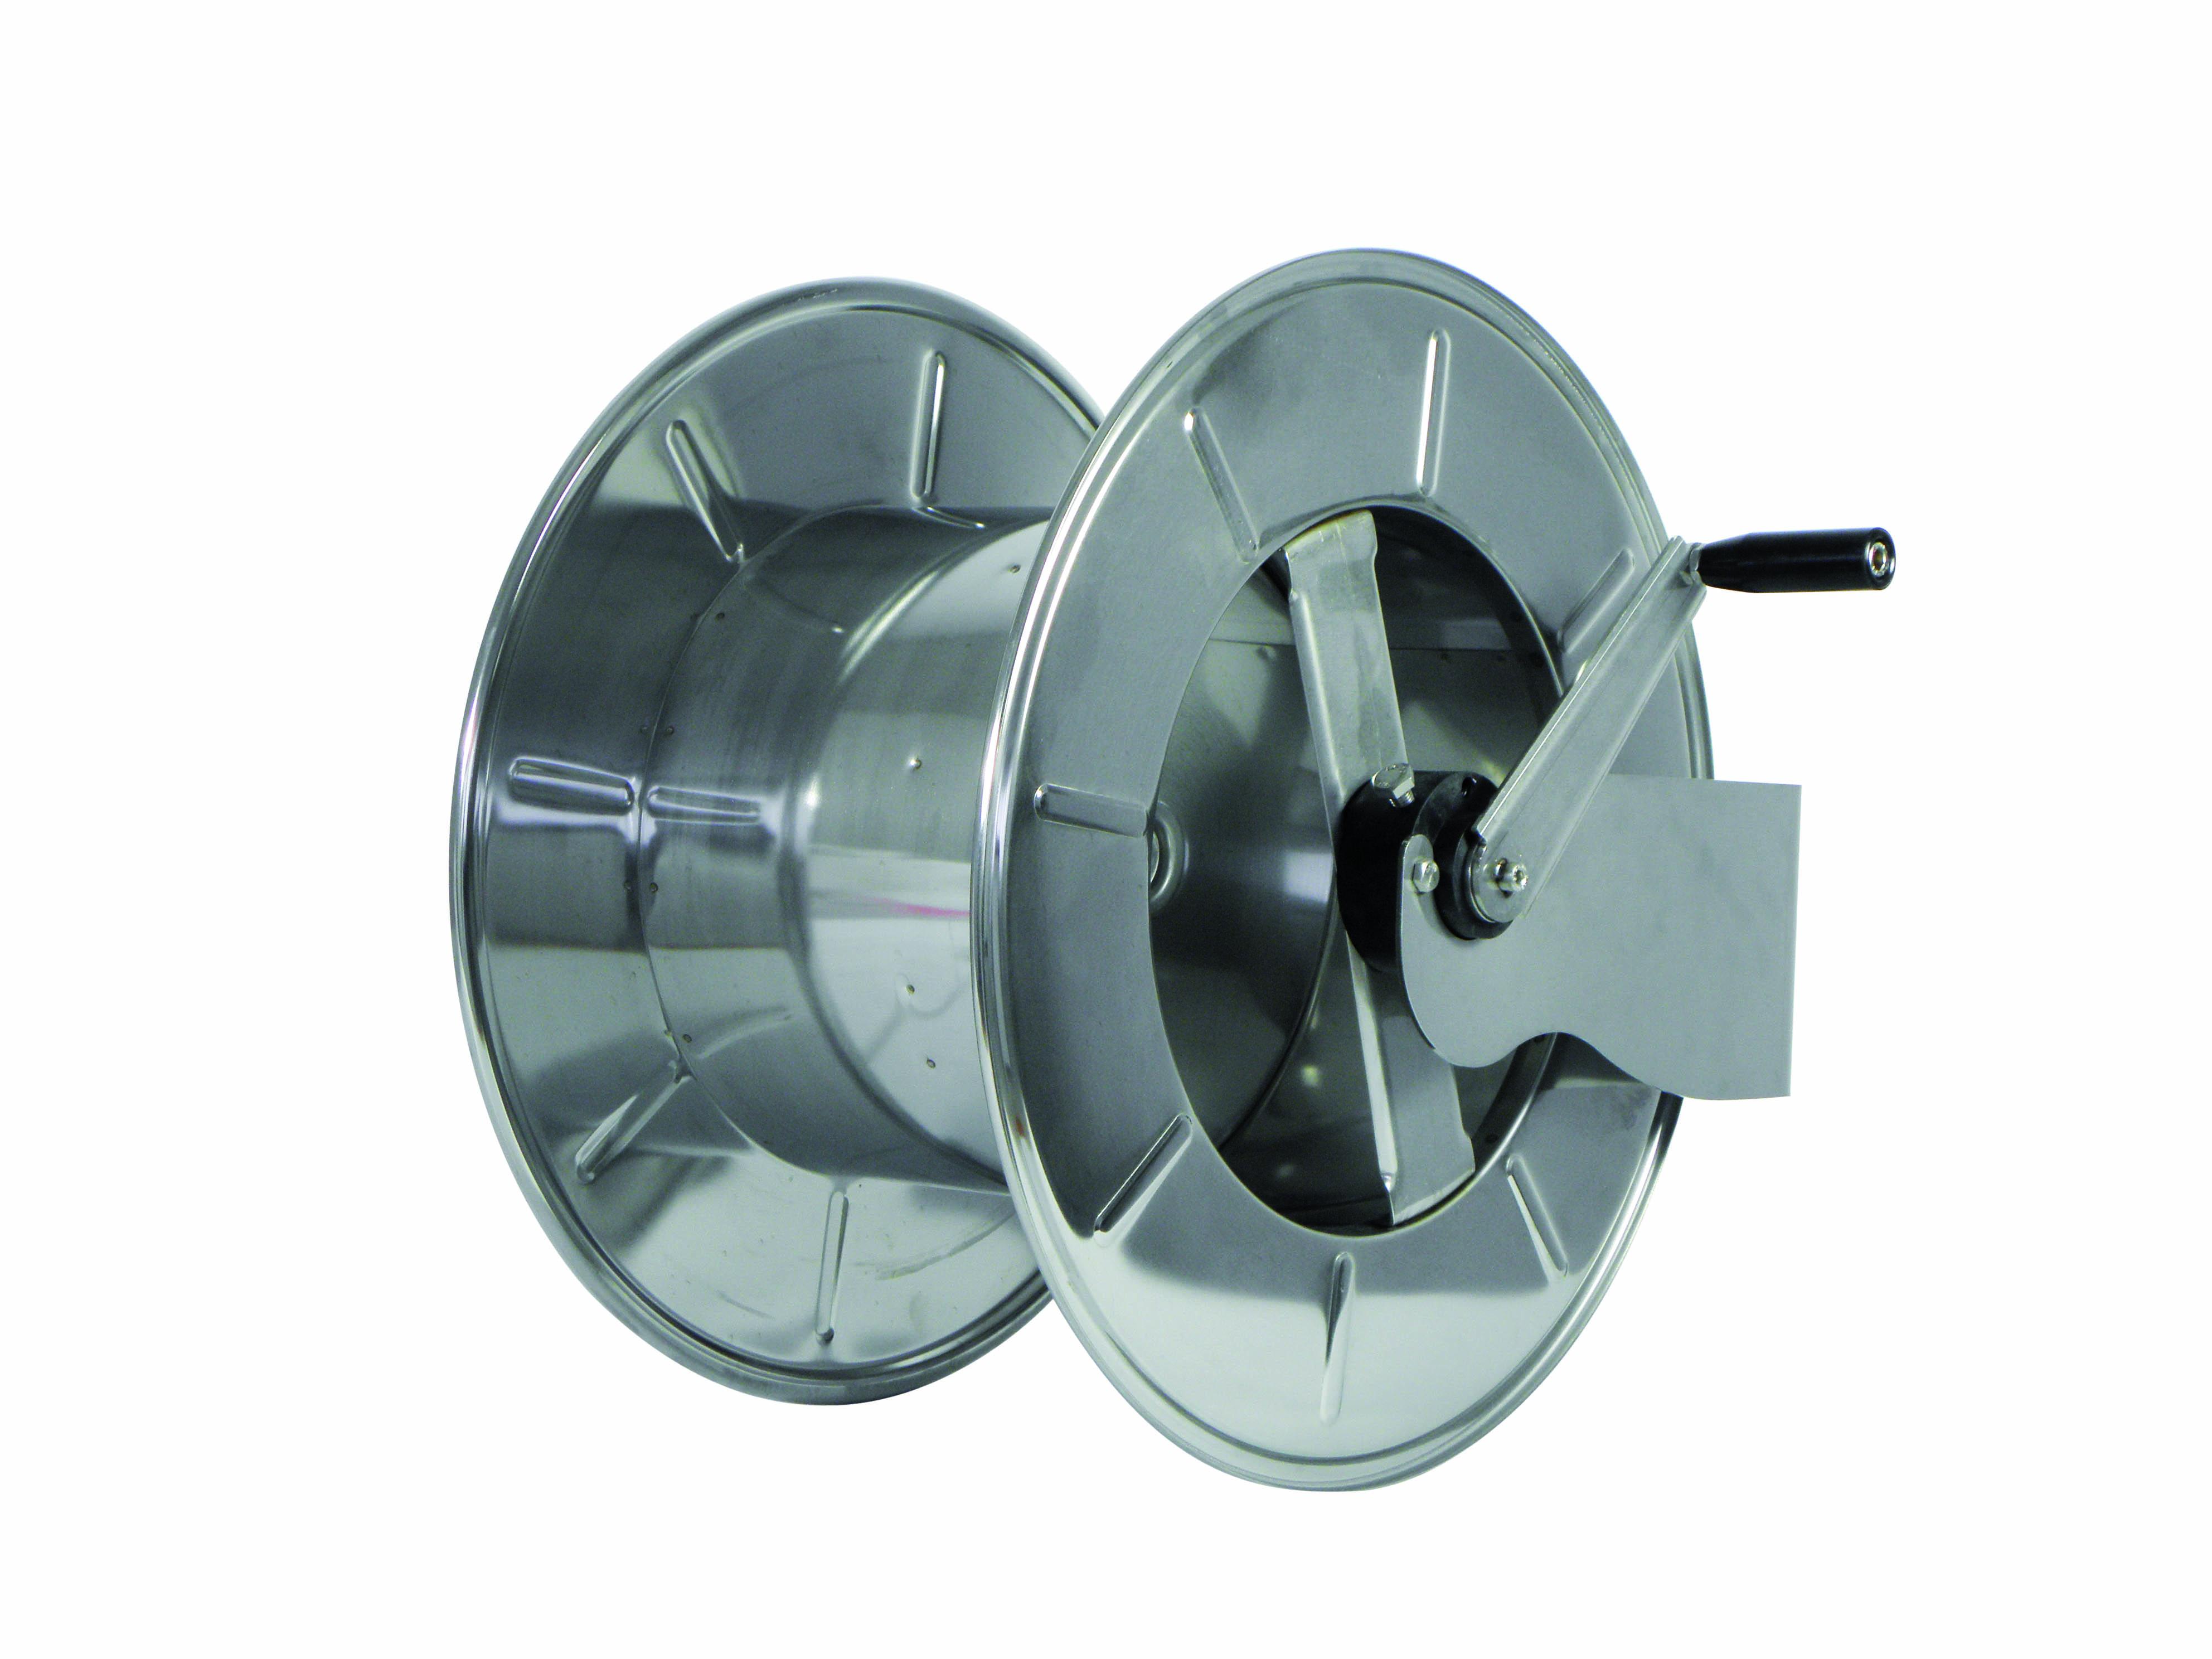 AVM9940 - Hose reels Water Standard Pressure 0-200 Bar/0-2900 PSI